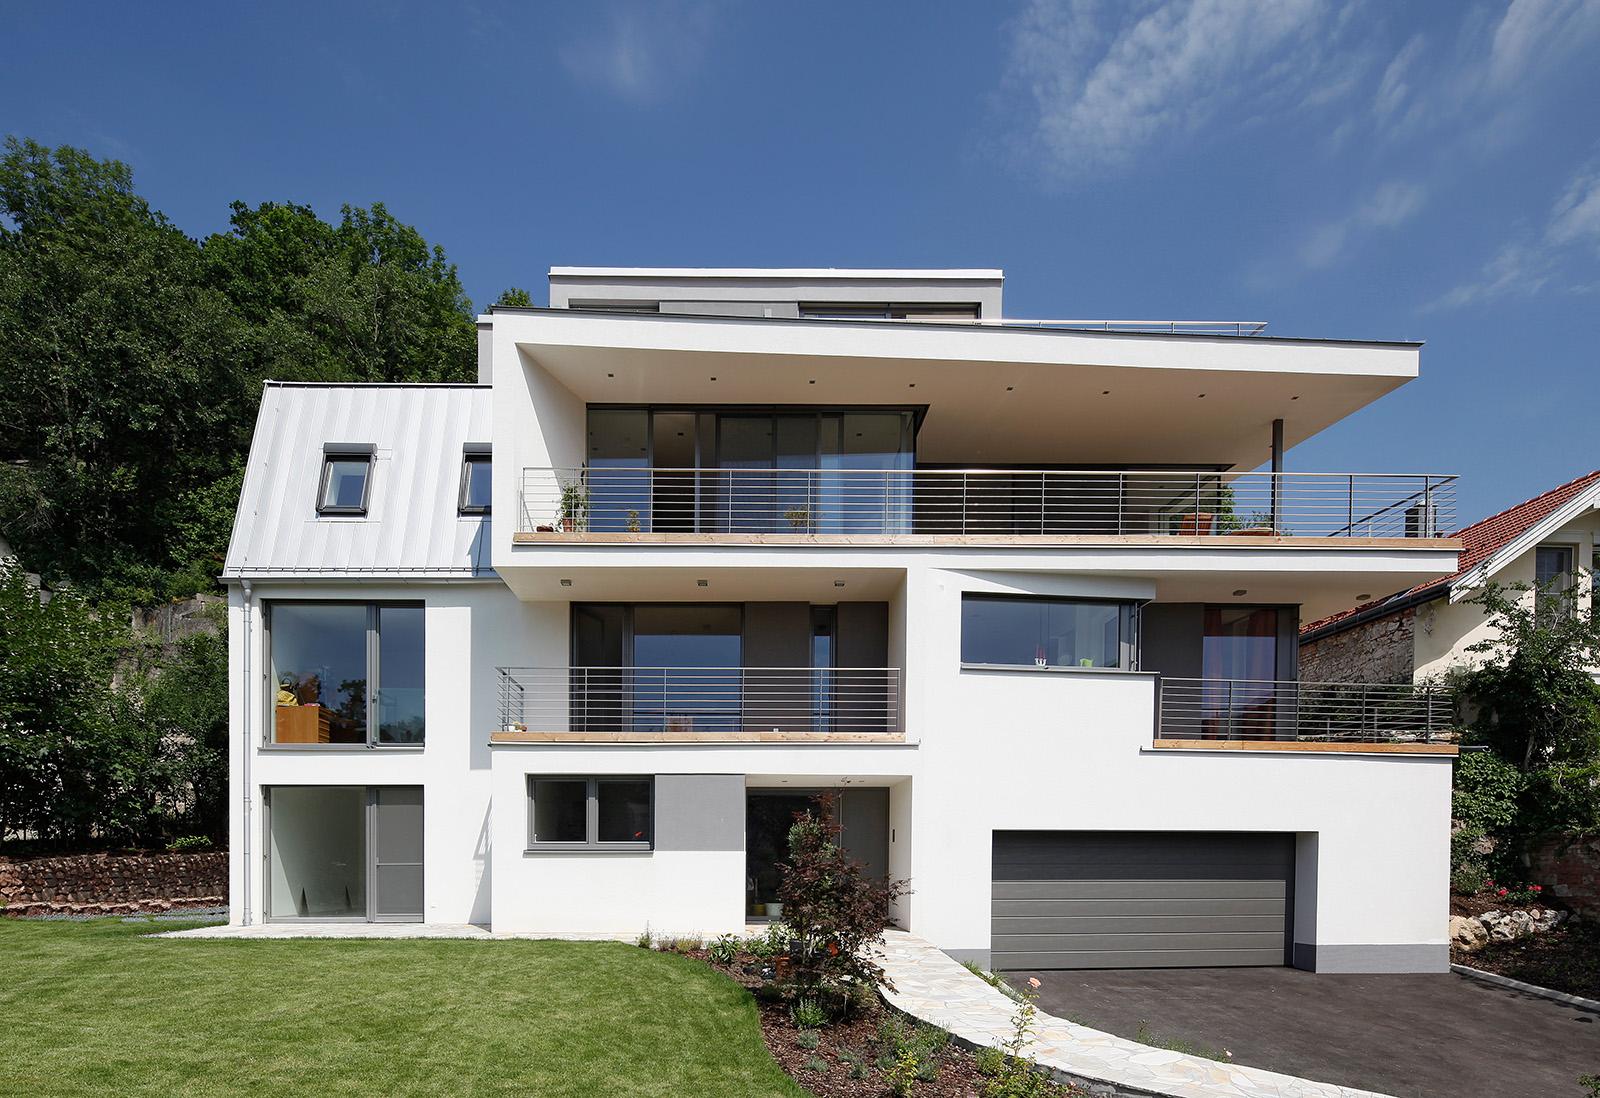 wunschhaus-haus-gh4-1